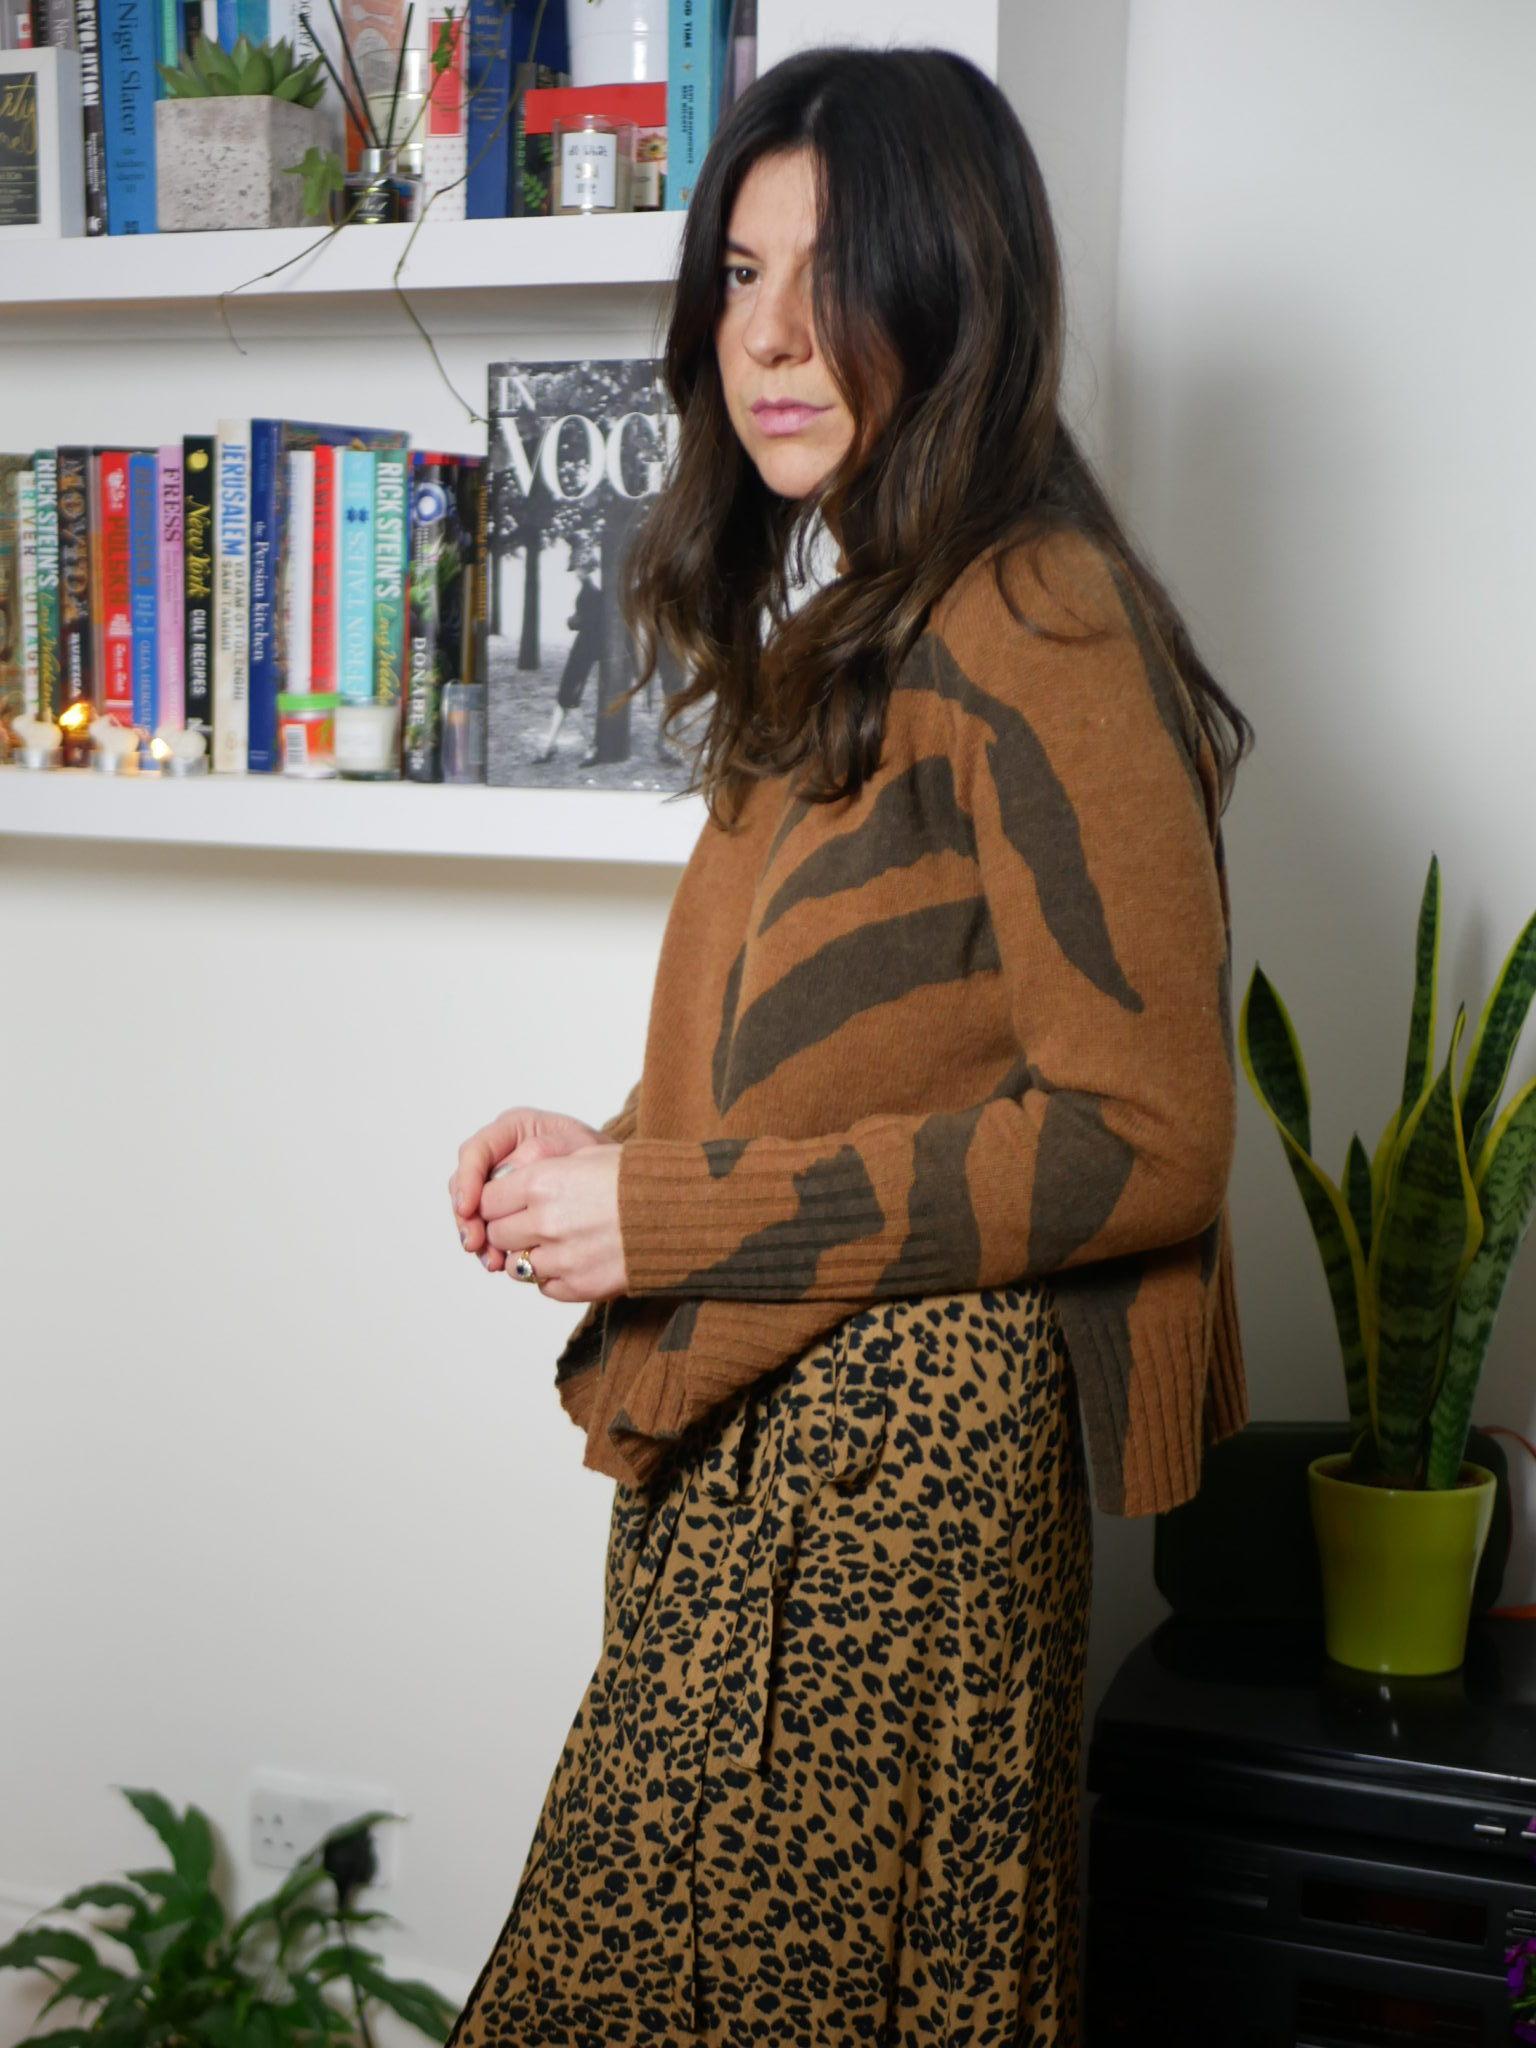 "<a href= ""https://www.endource.com/product/and-other-stories-leopard-print-wrap-dress/W-RcwUbg-wAB2FRl""><u>Dress: & Other Stories</a></u><br/><a href= ""https://www.endource.com/product/whistles-animal-funnel-neck-wool-knit/W63YsEbg-wABwXH4""><u>Jumper: Whistles</a></u>"